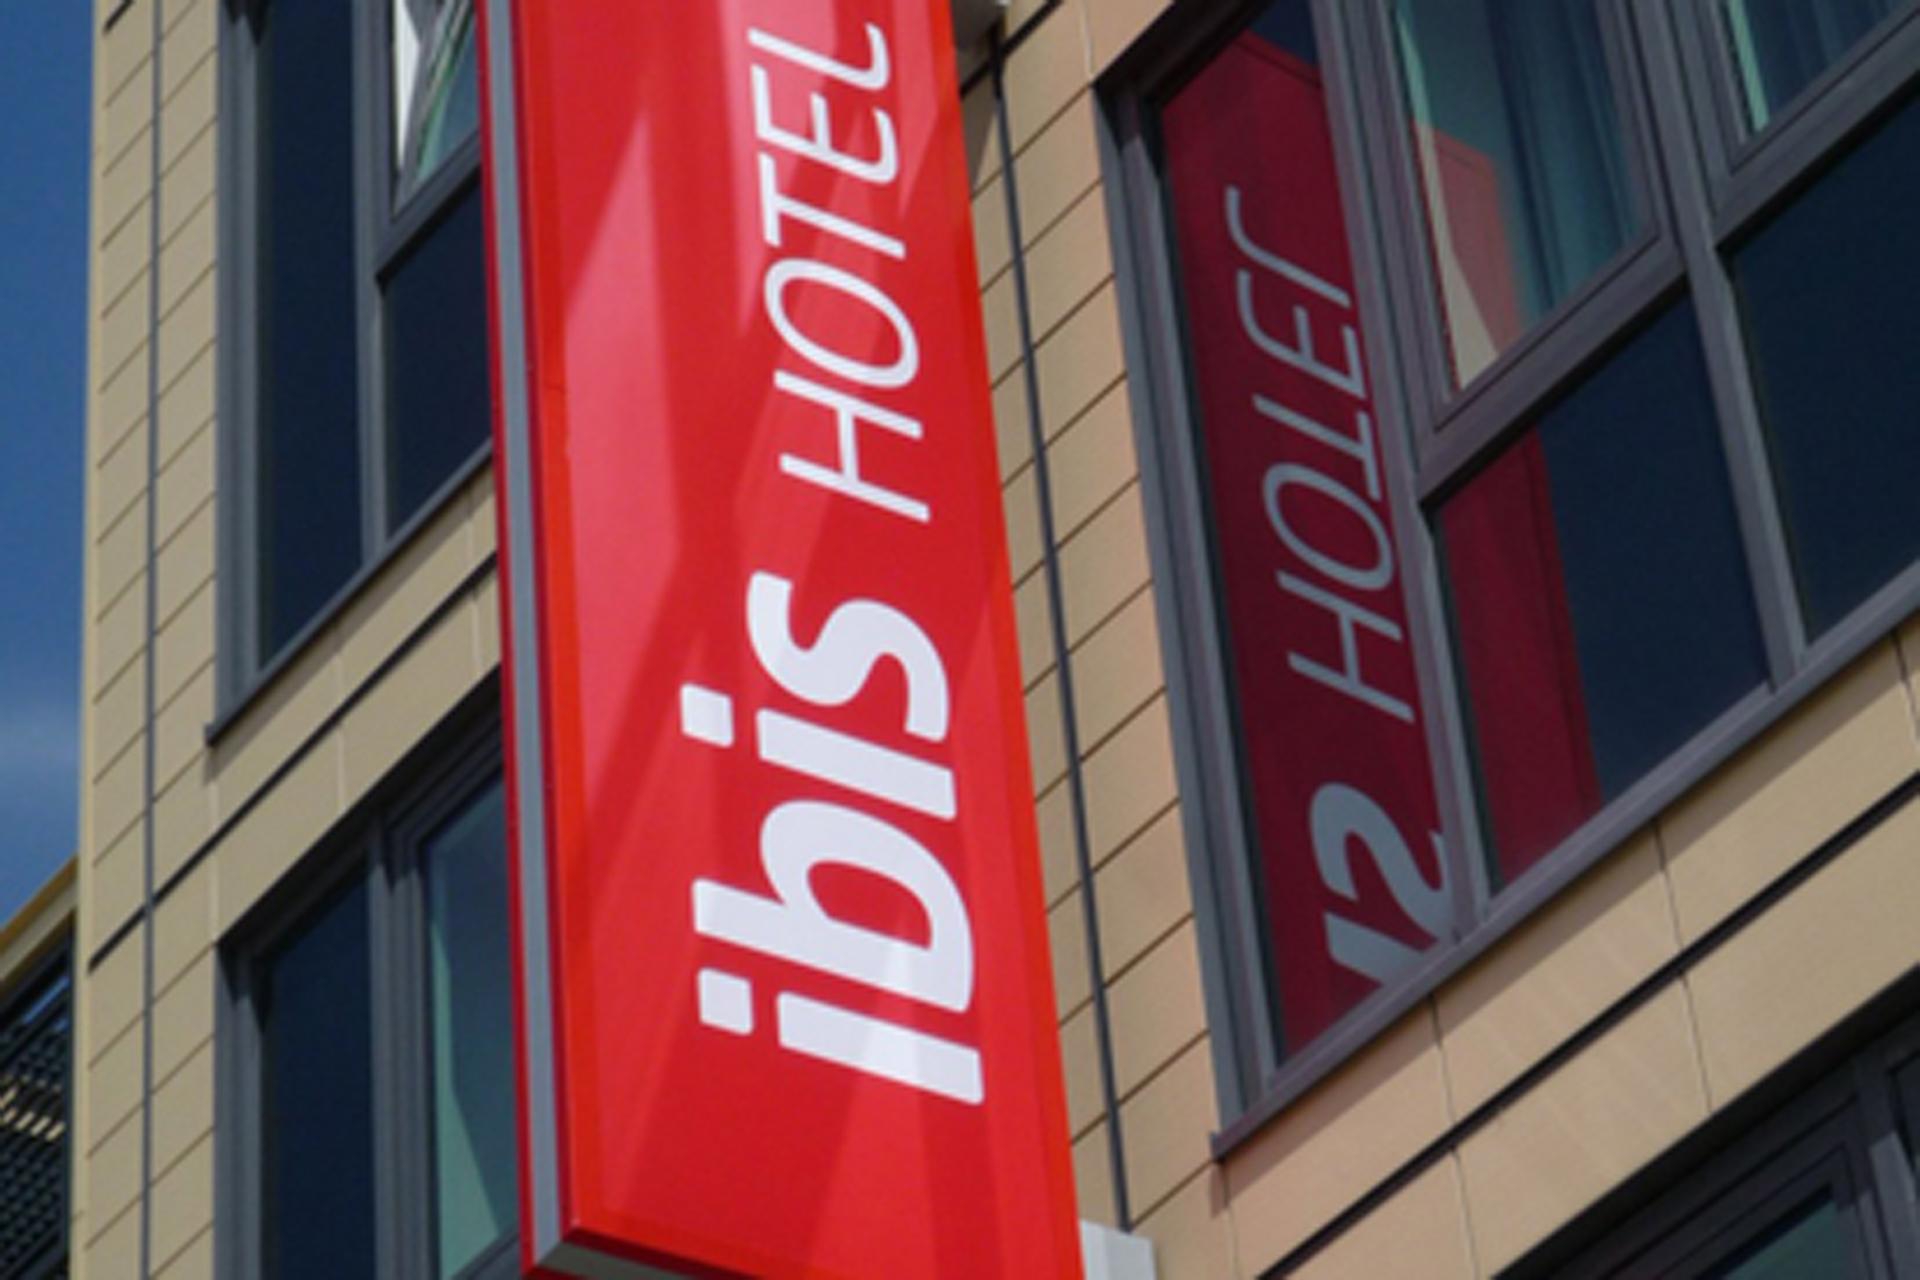 ibis Hotels Rebranding